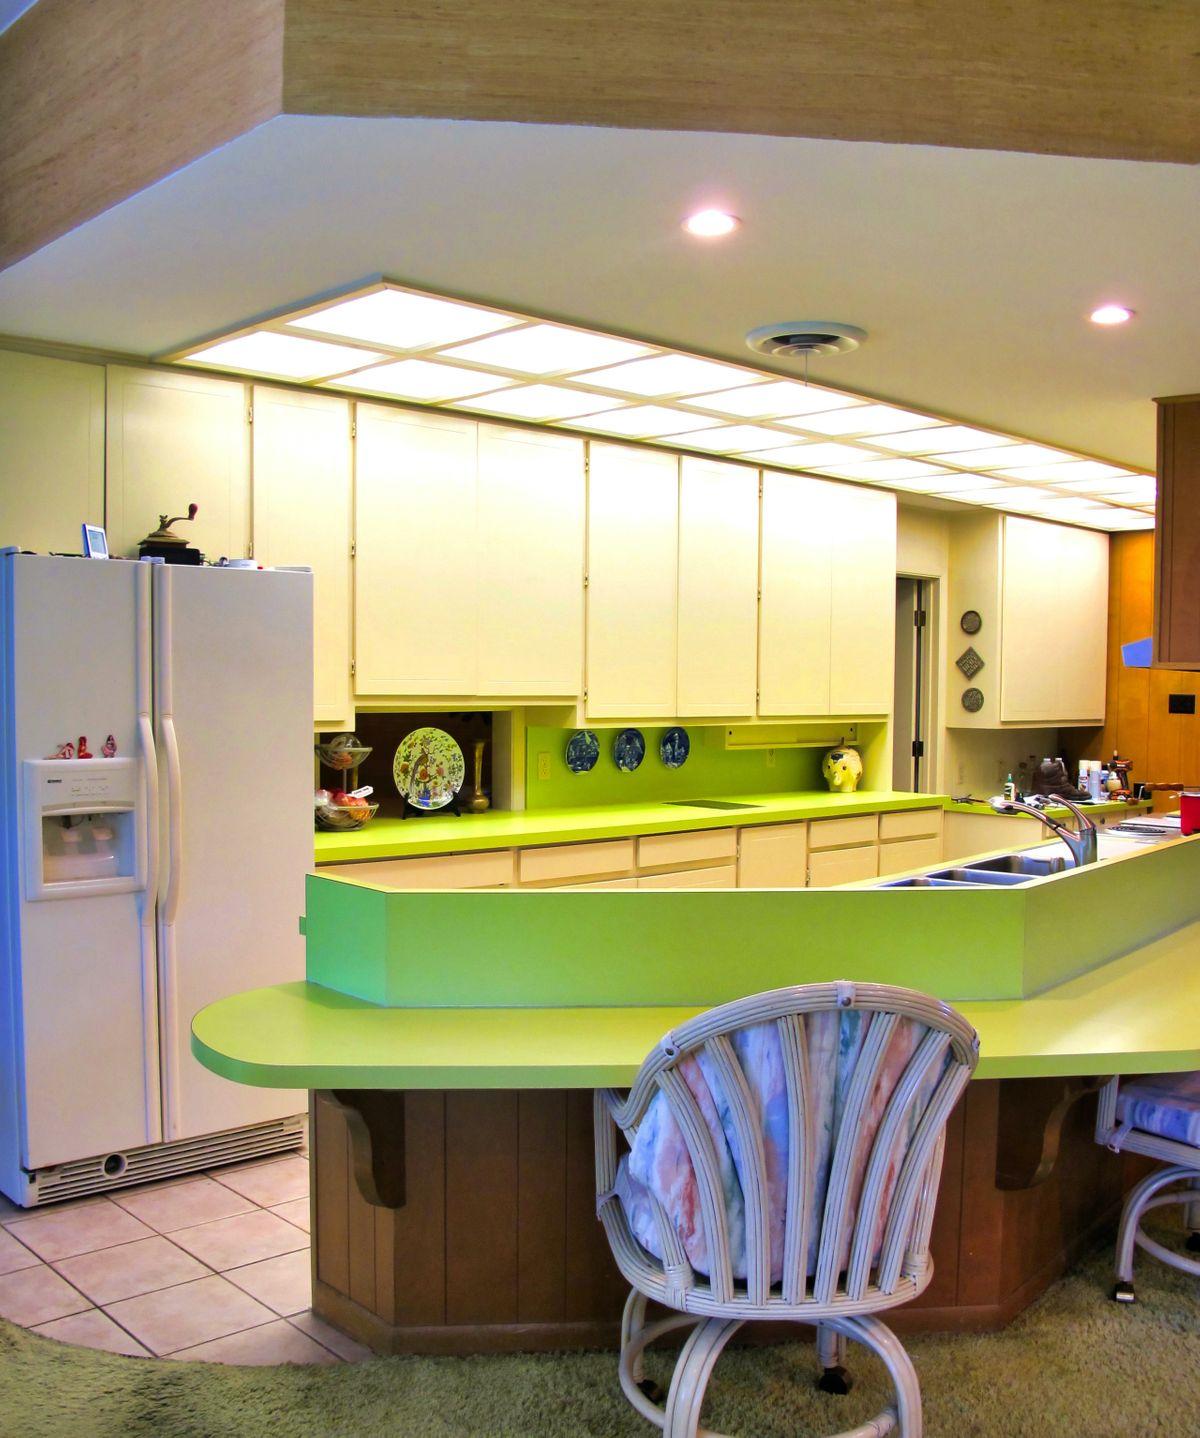 Shagplace Mid Century Modern Home Photo Video Shoot Location Dallas54.jpeg